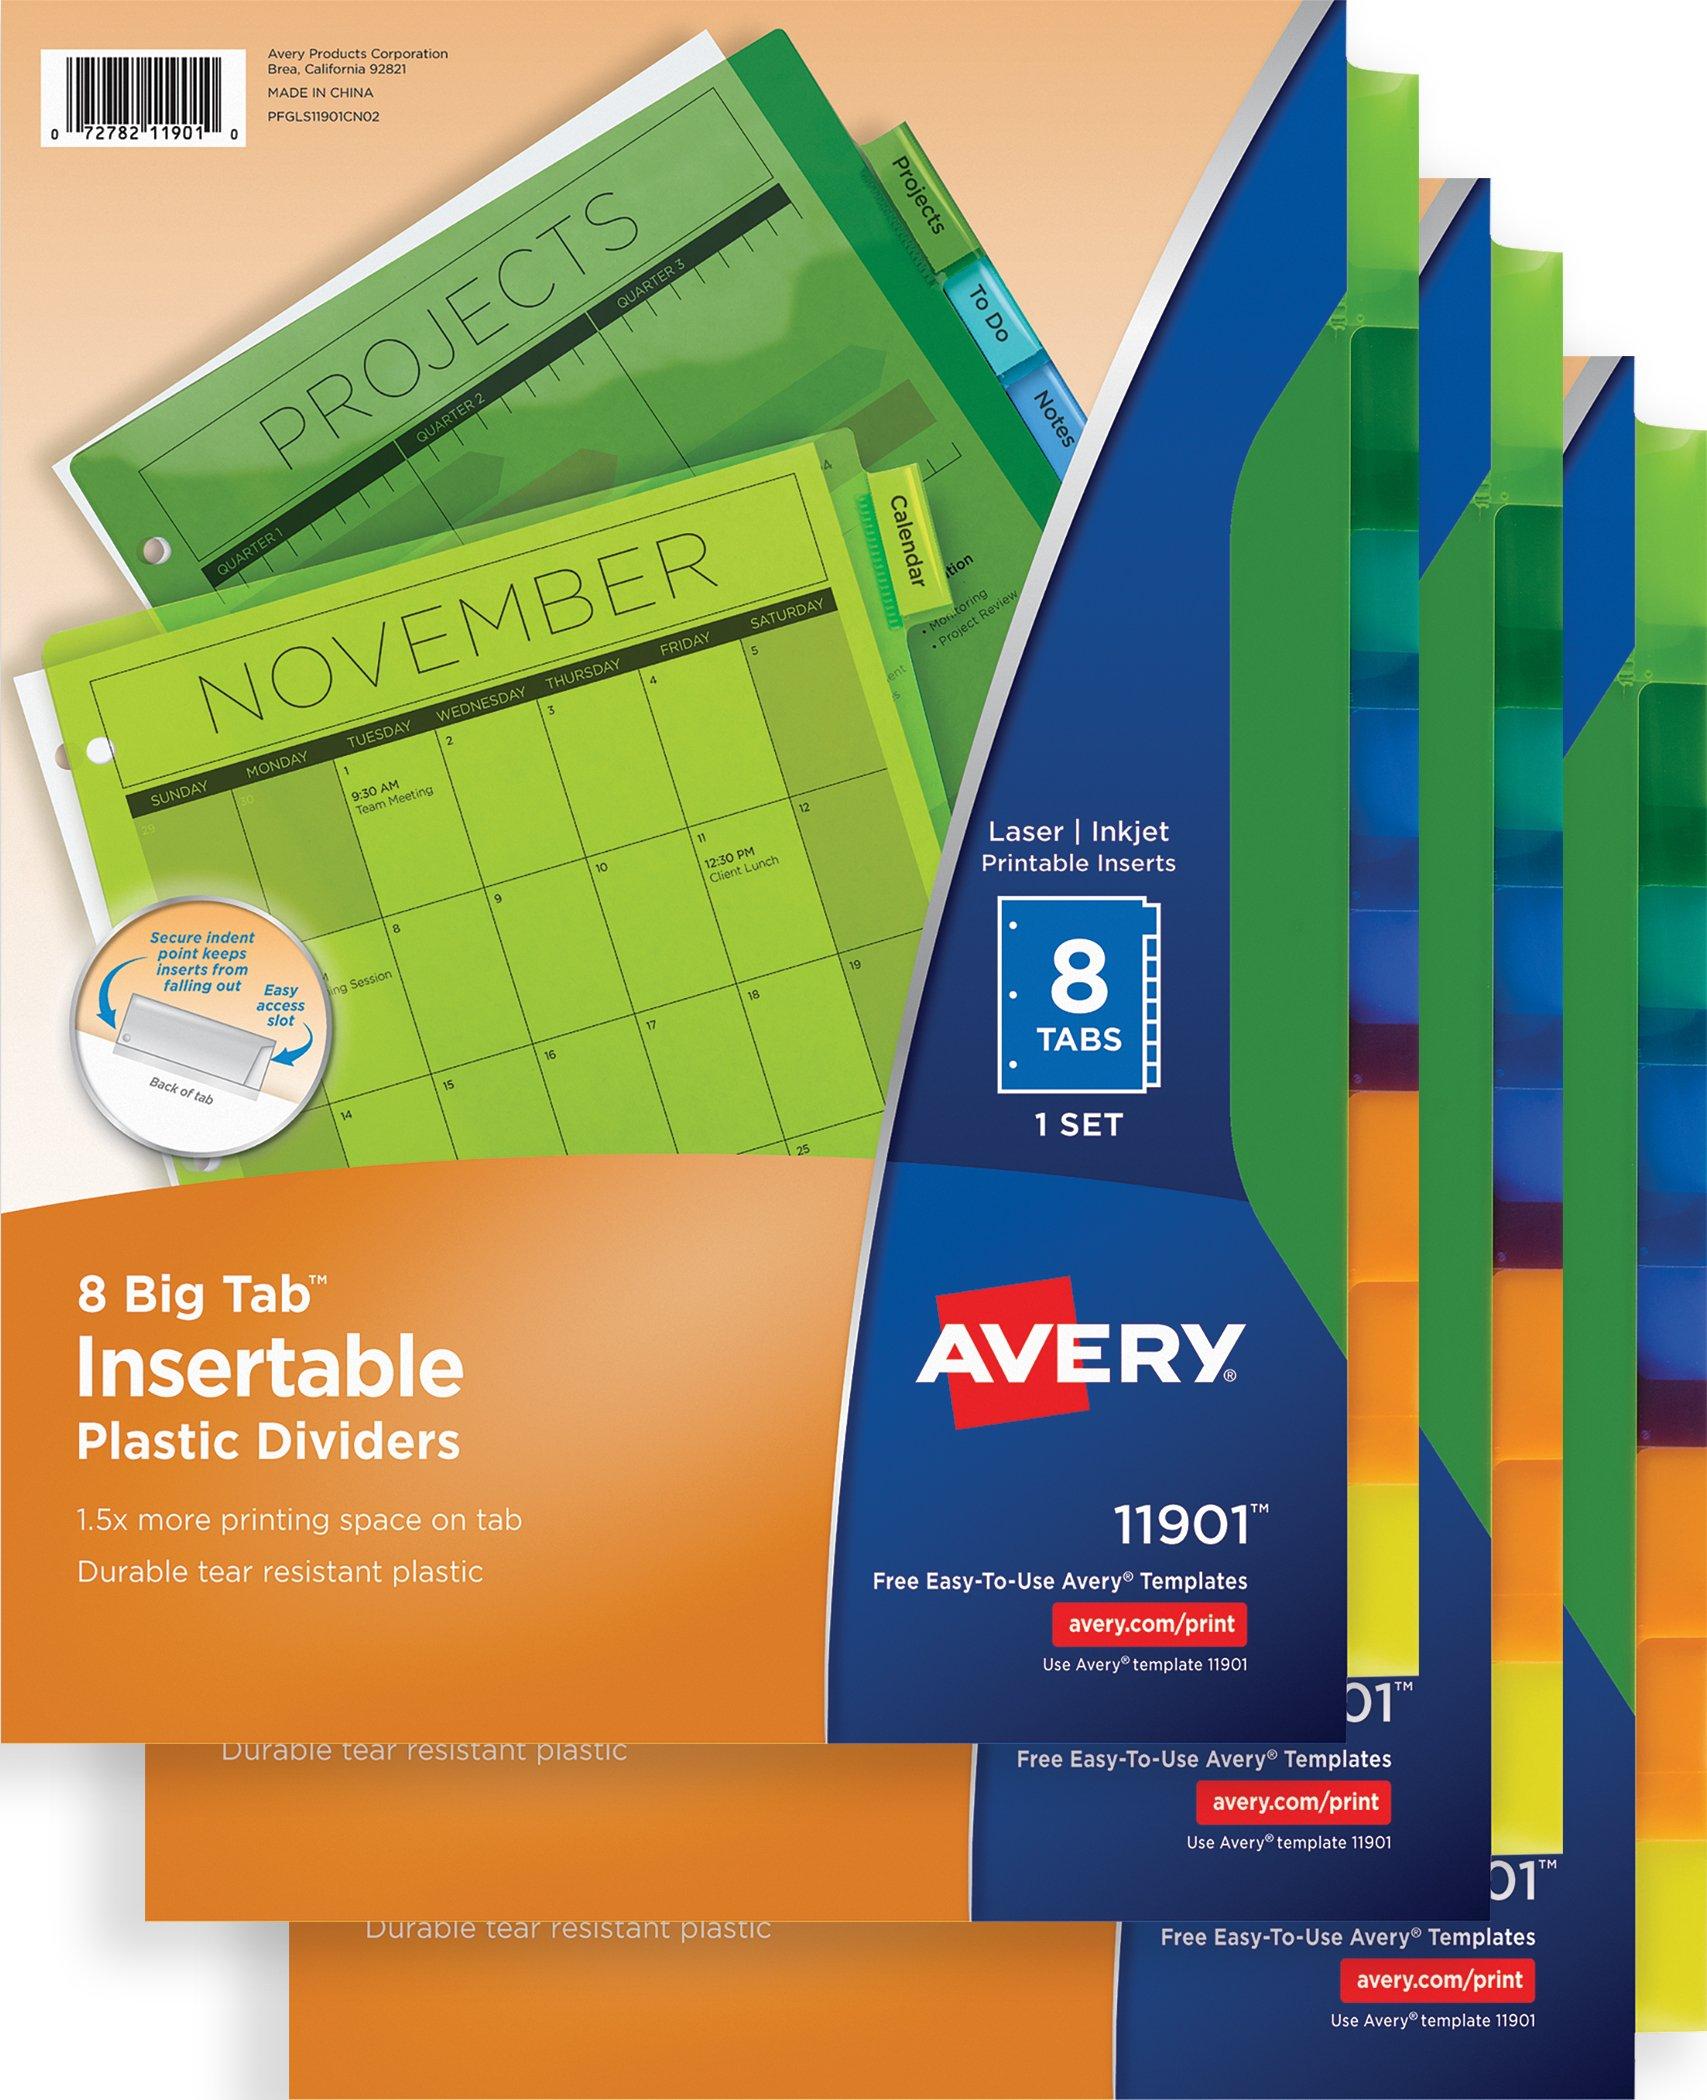 Avery Big Tab Insertable Plastic Dividers, 8-Tab Set, Multicolor, Multi Pack of 3 Sets (11901)